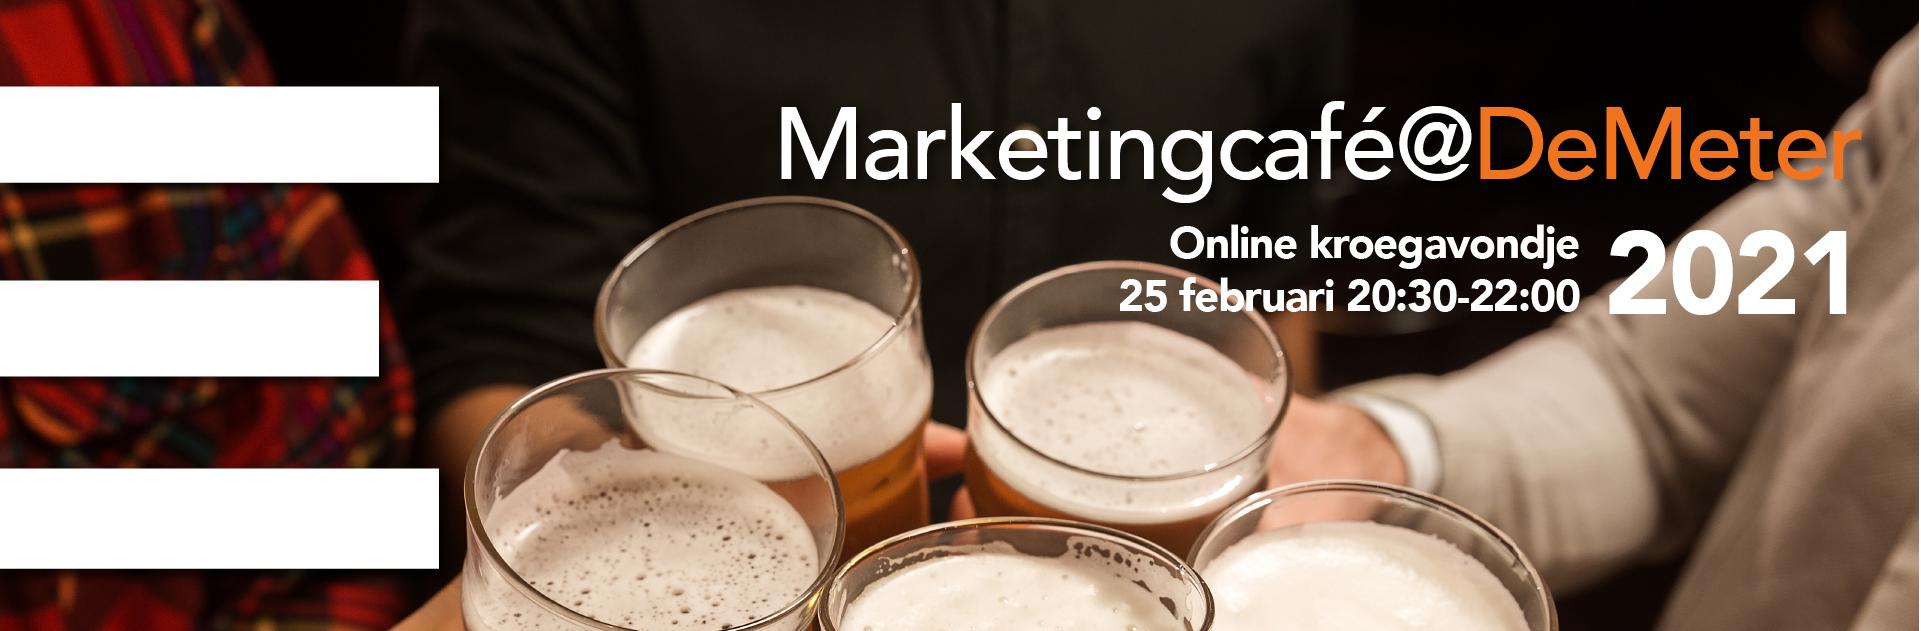 DeMeter_Marketingcafe